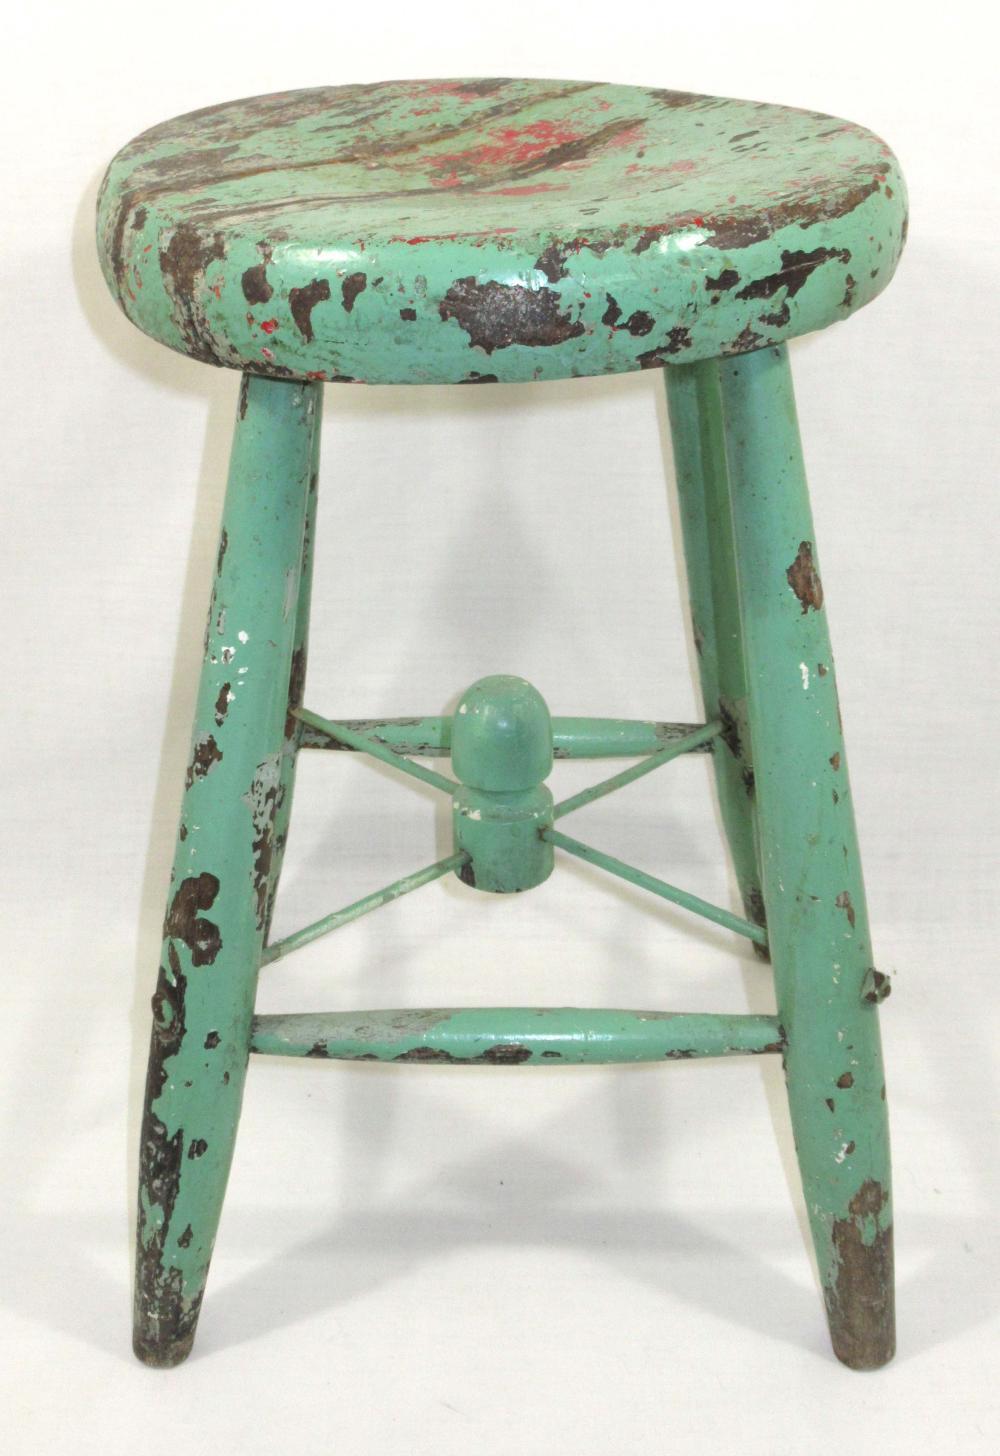 Strange Wood Stool W Old Green Paint Lamtechconsult Wood Chair Design Ideas Lamtechconsultcom